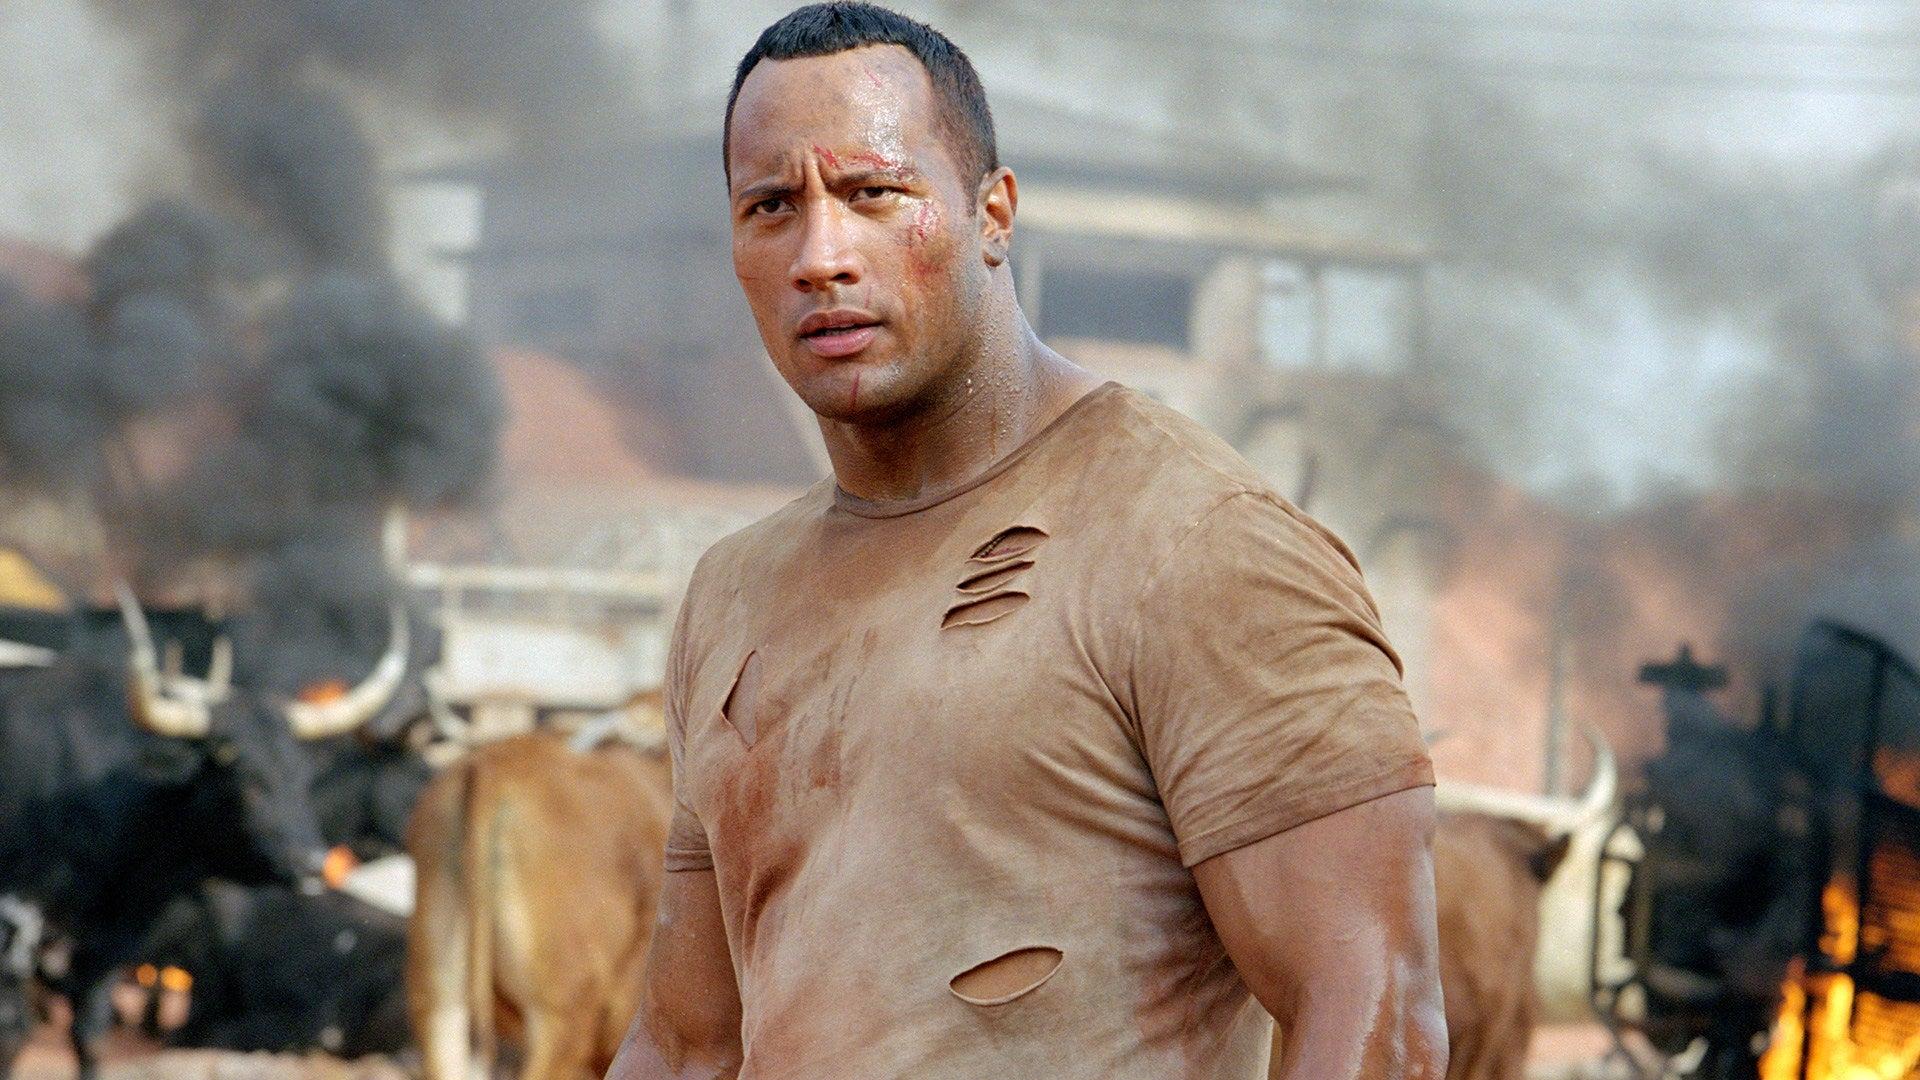 Dwayne Johnson at action scene